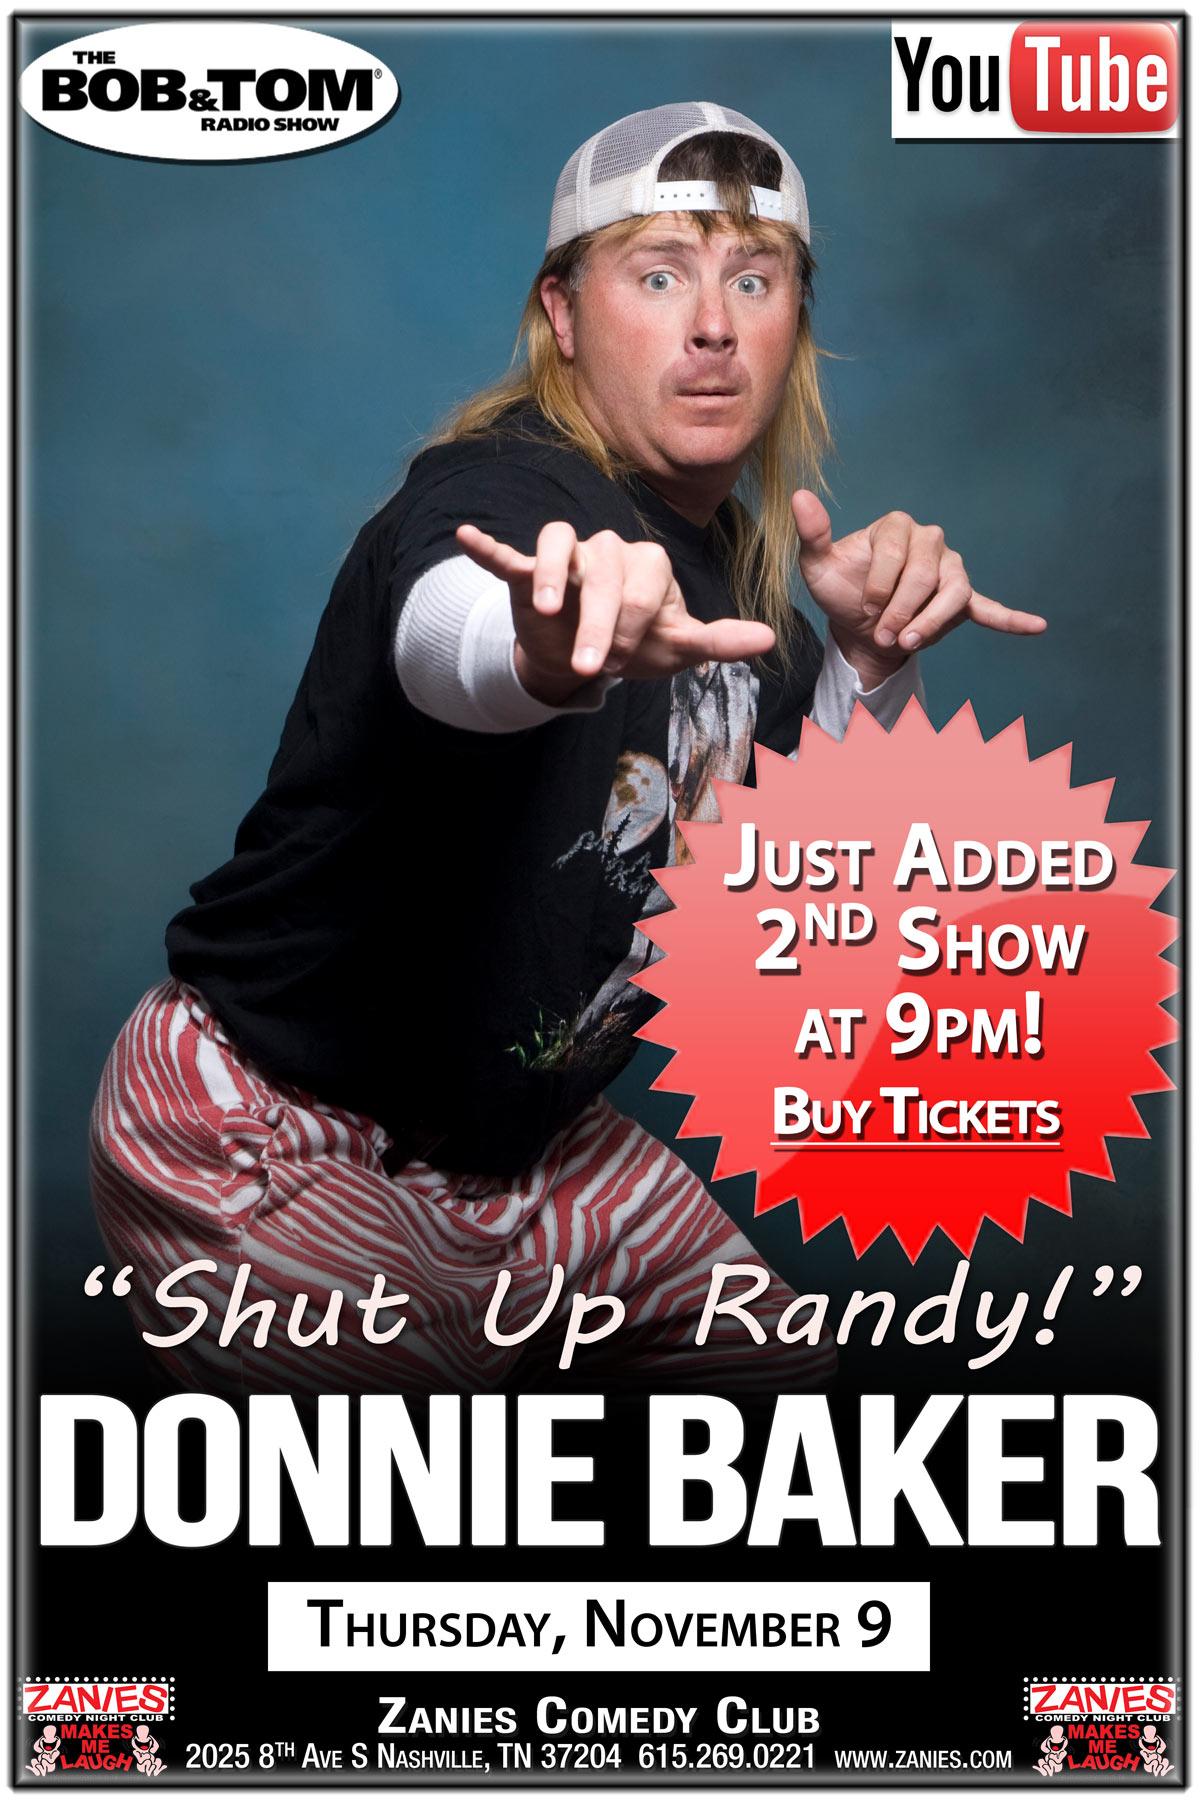 Donnie Baker live at Zanies Comedy Club Nashville November 9, 2017